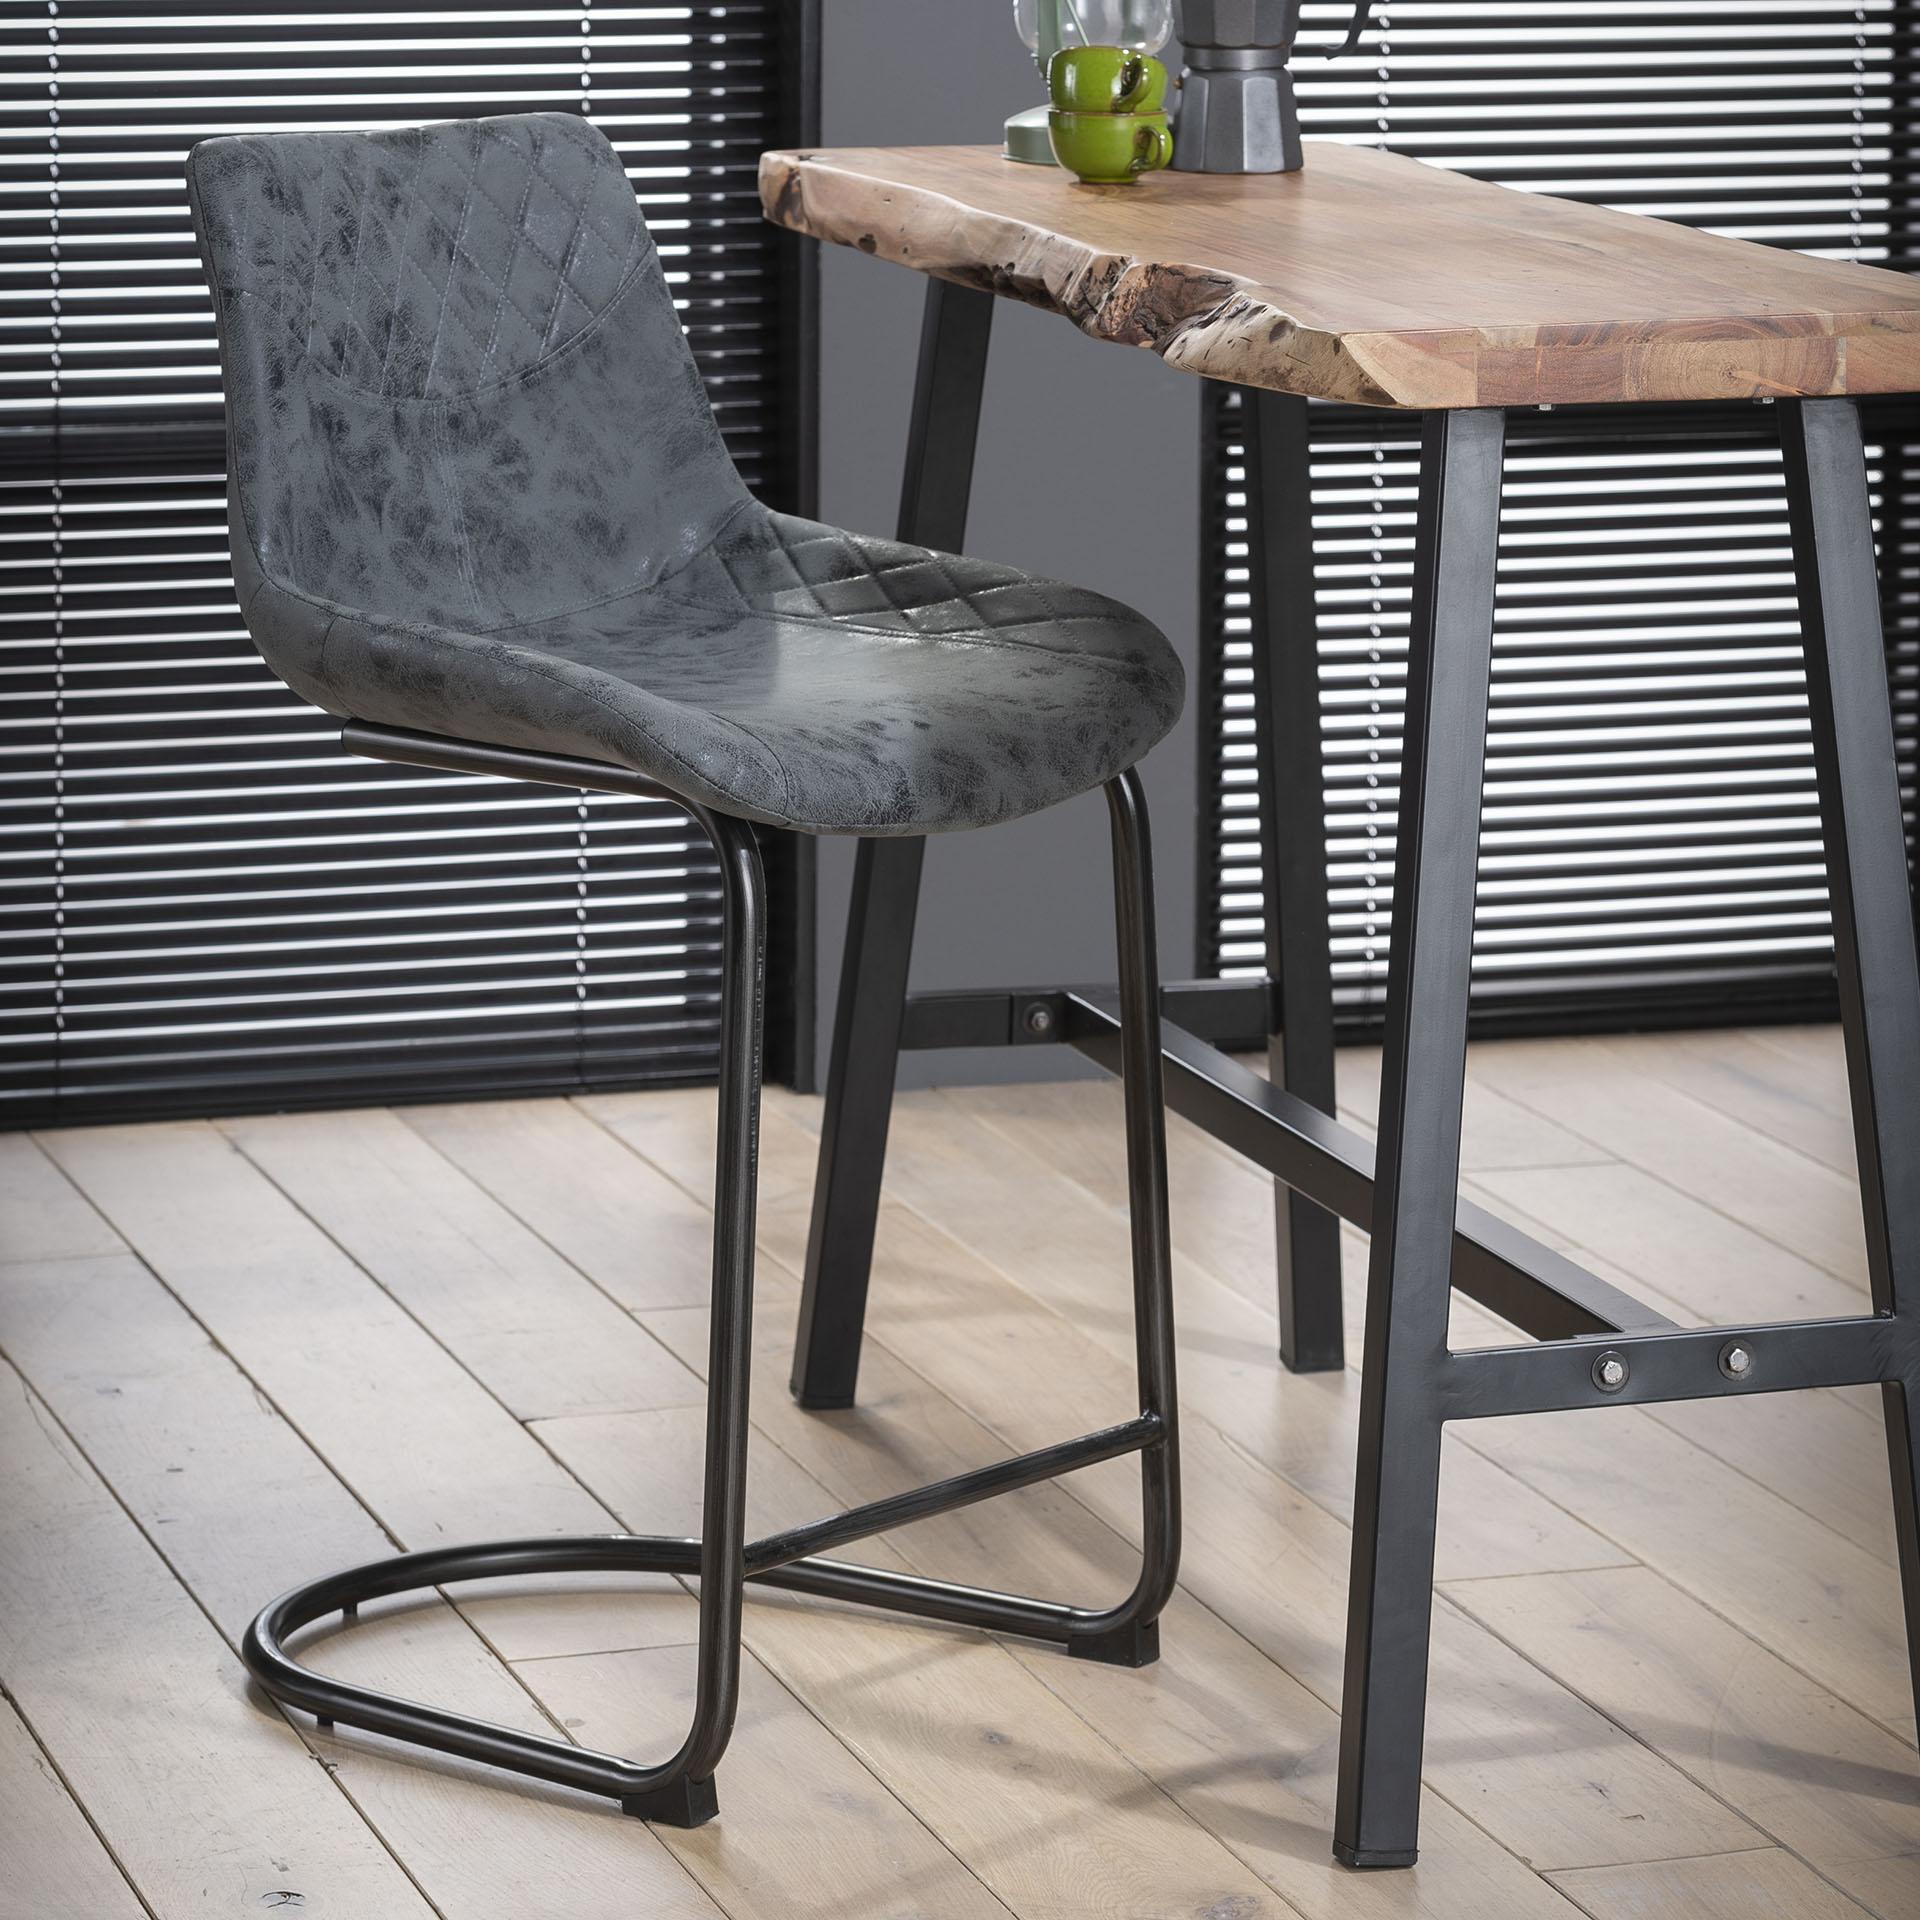 Barstoel 'Jean-Pierre' zithoogte 66cm, kleur zwart Root Catalog